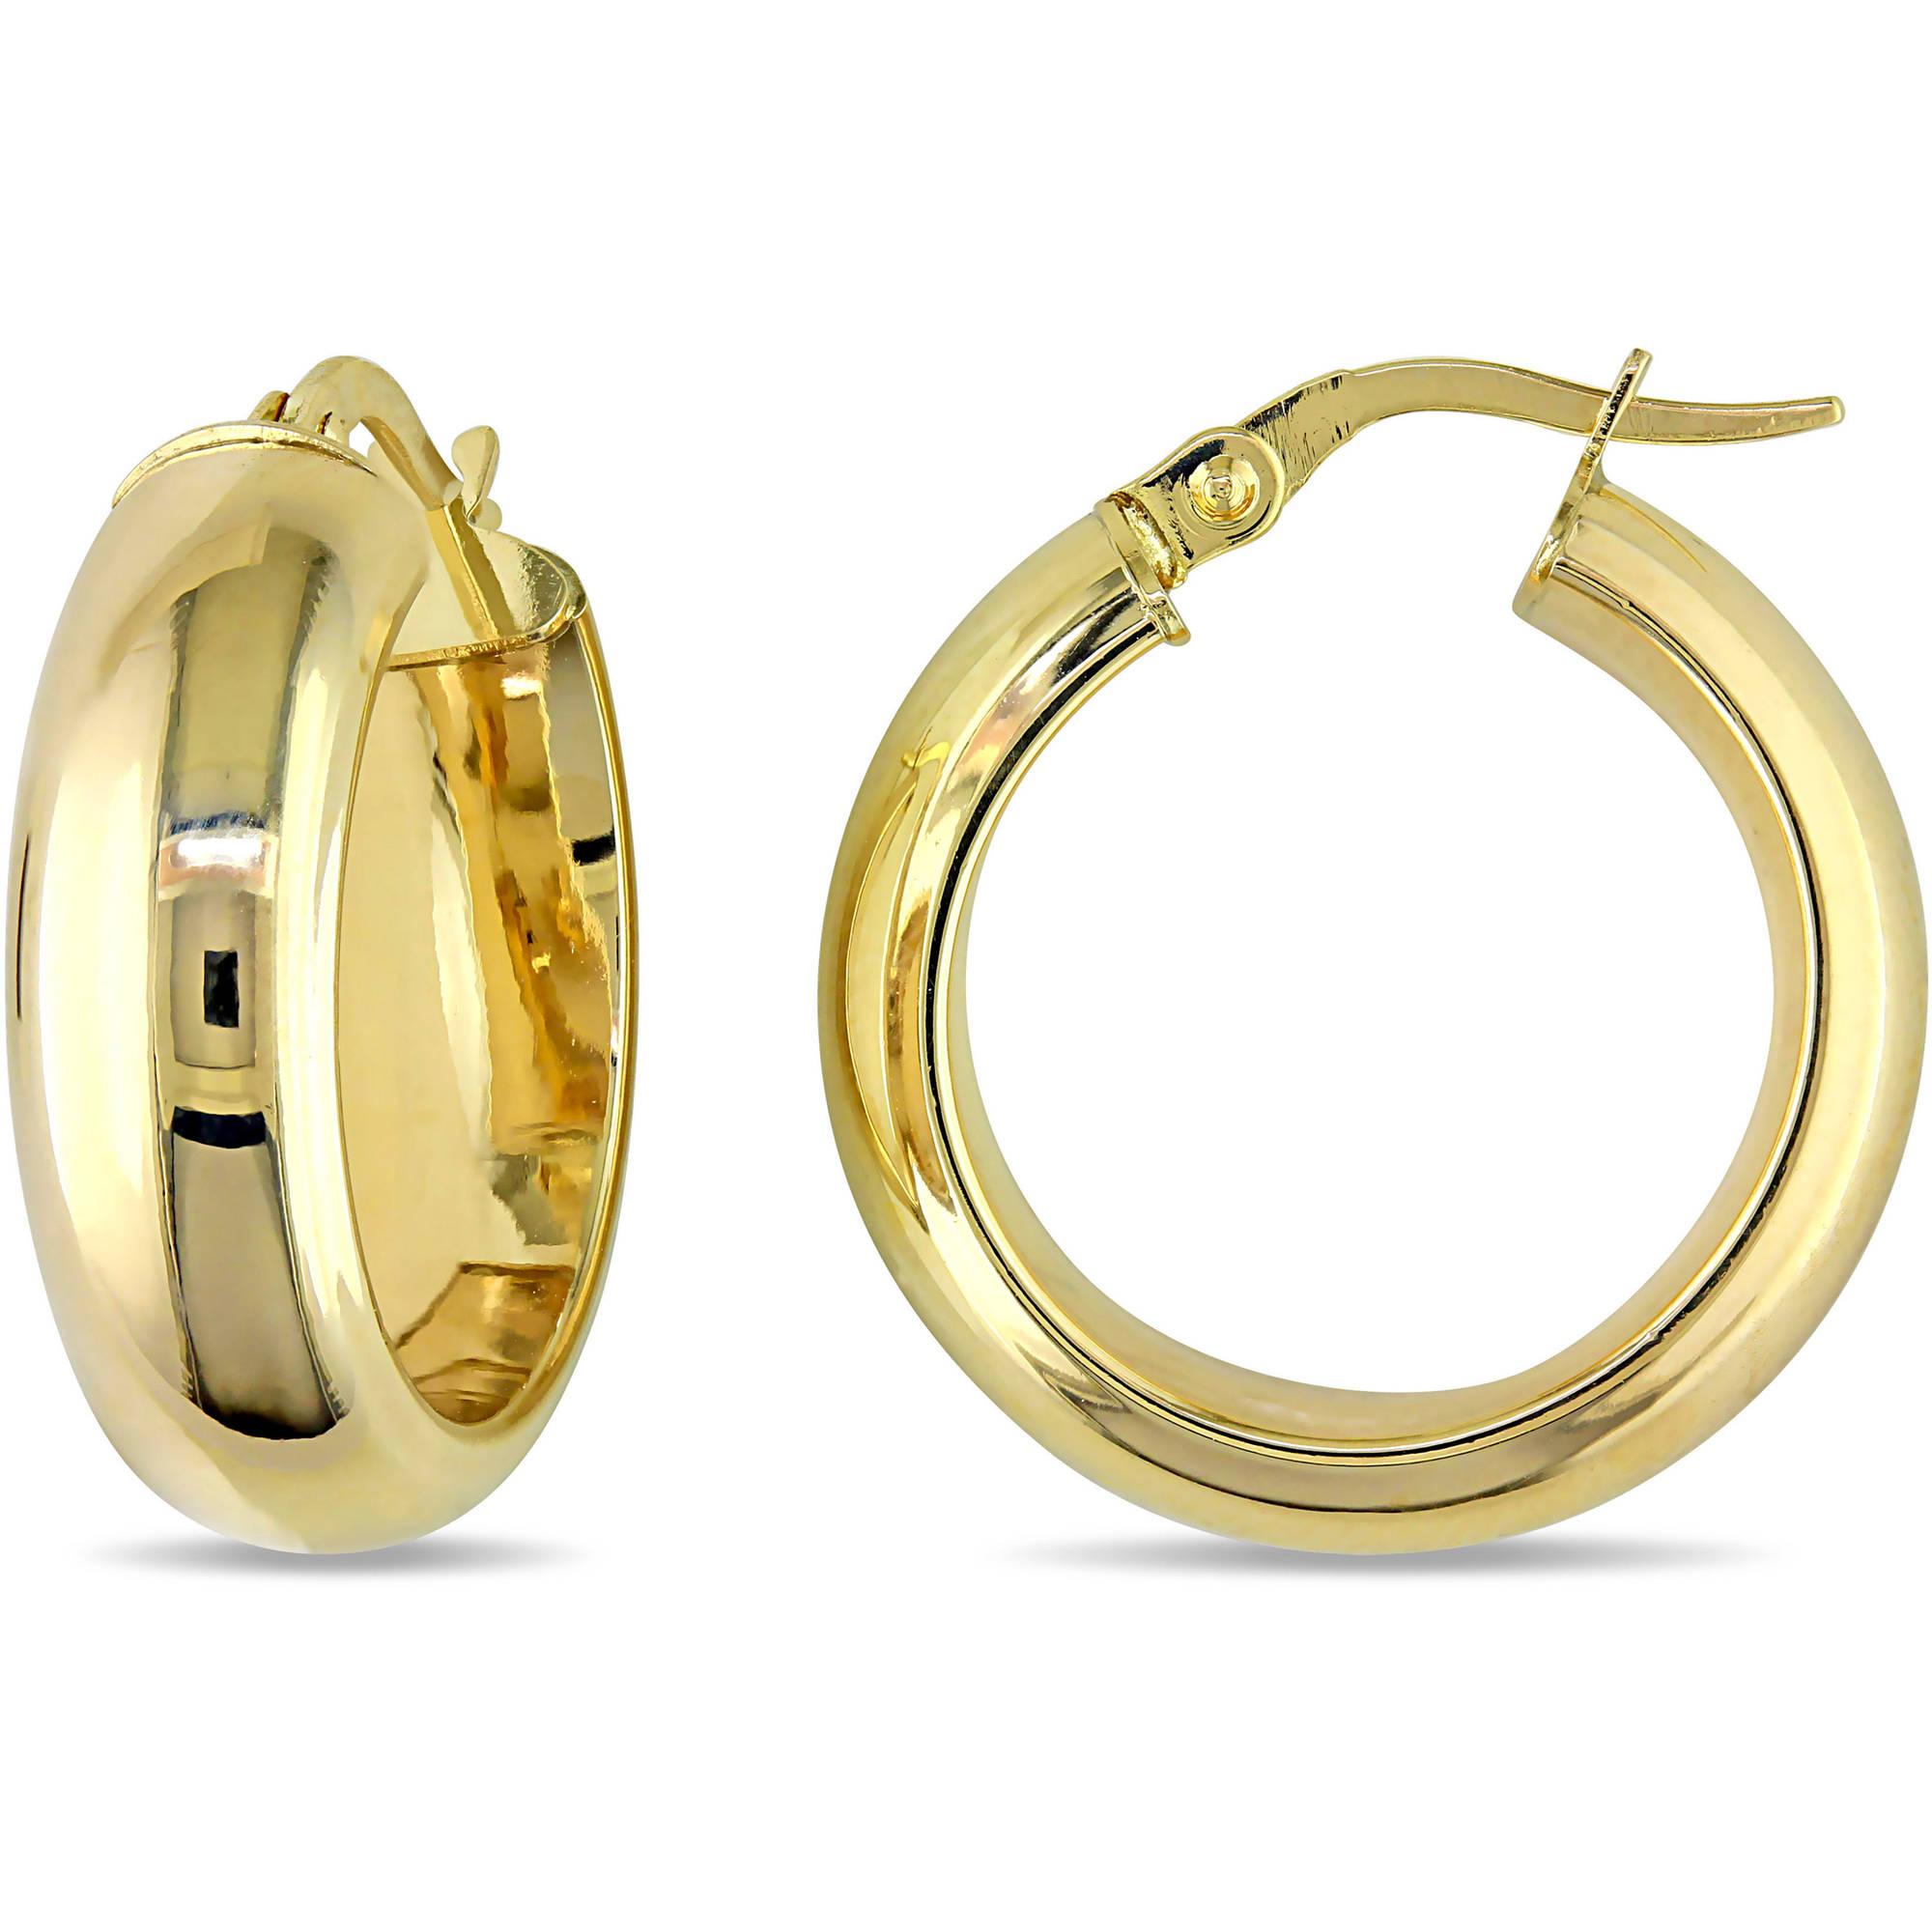 Classic 10 Karat Yellow Gold Hoop Earrings 20mm Diameter Walmart Com